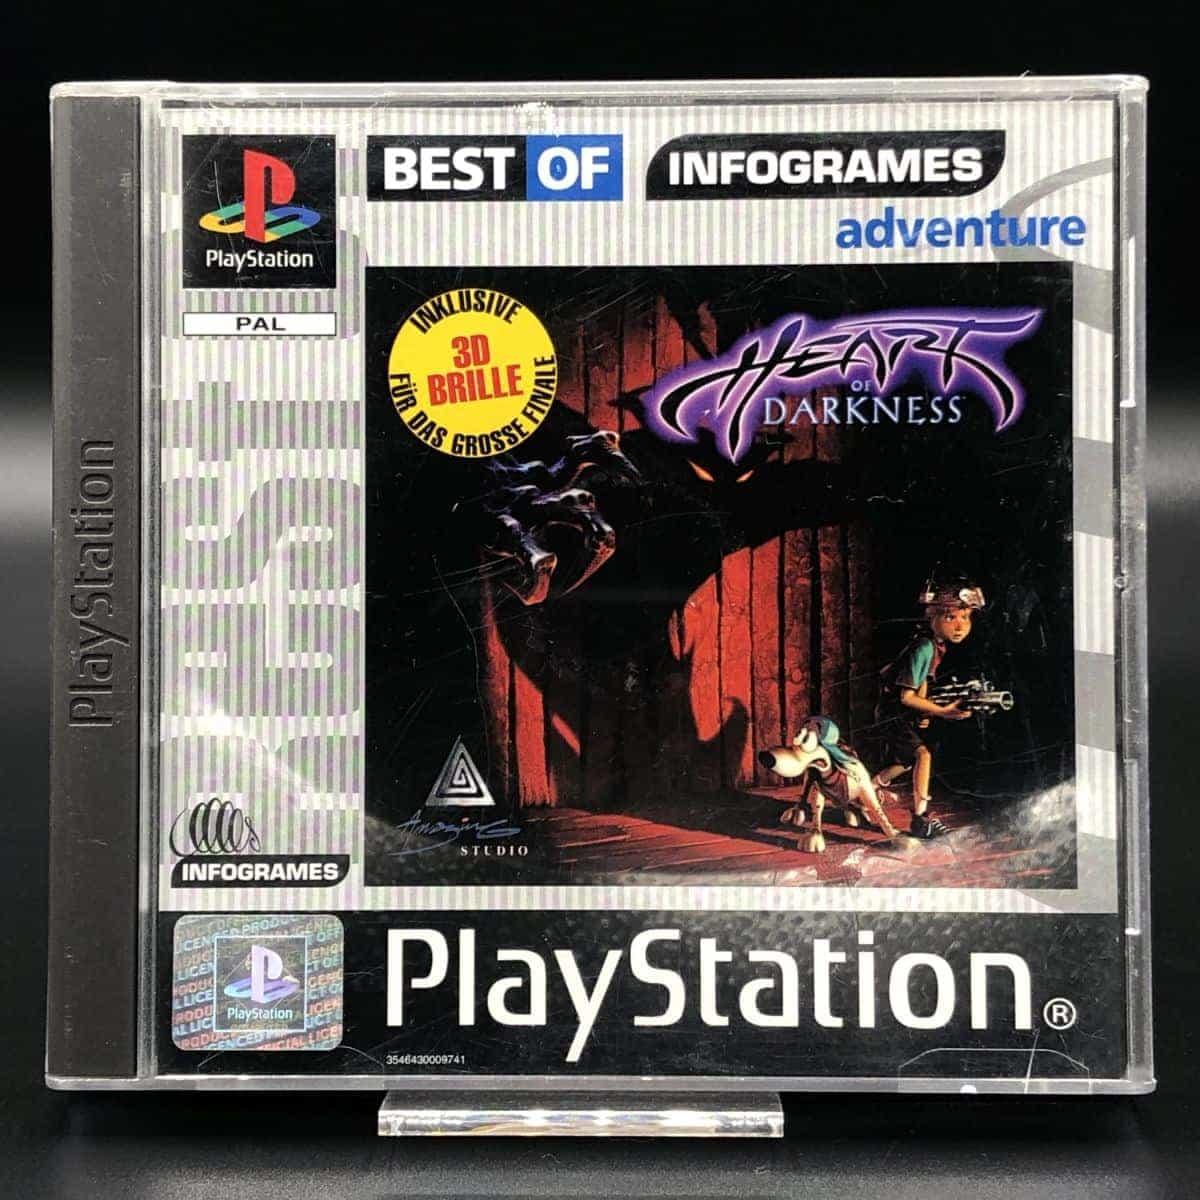 PS1 Heart of Darkness (Best of Infogrames) (Komplett) (Sehr gut) Sony PlayStation 1